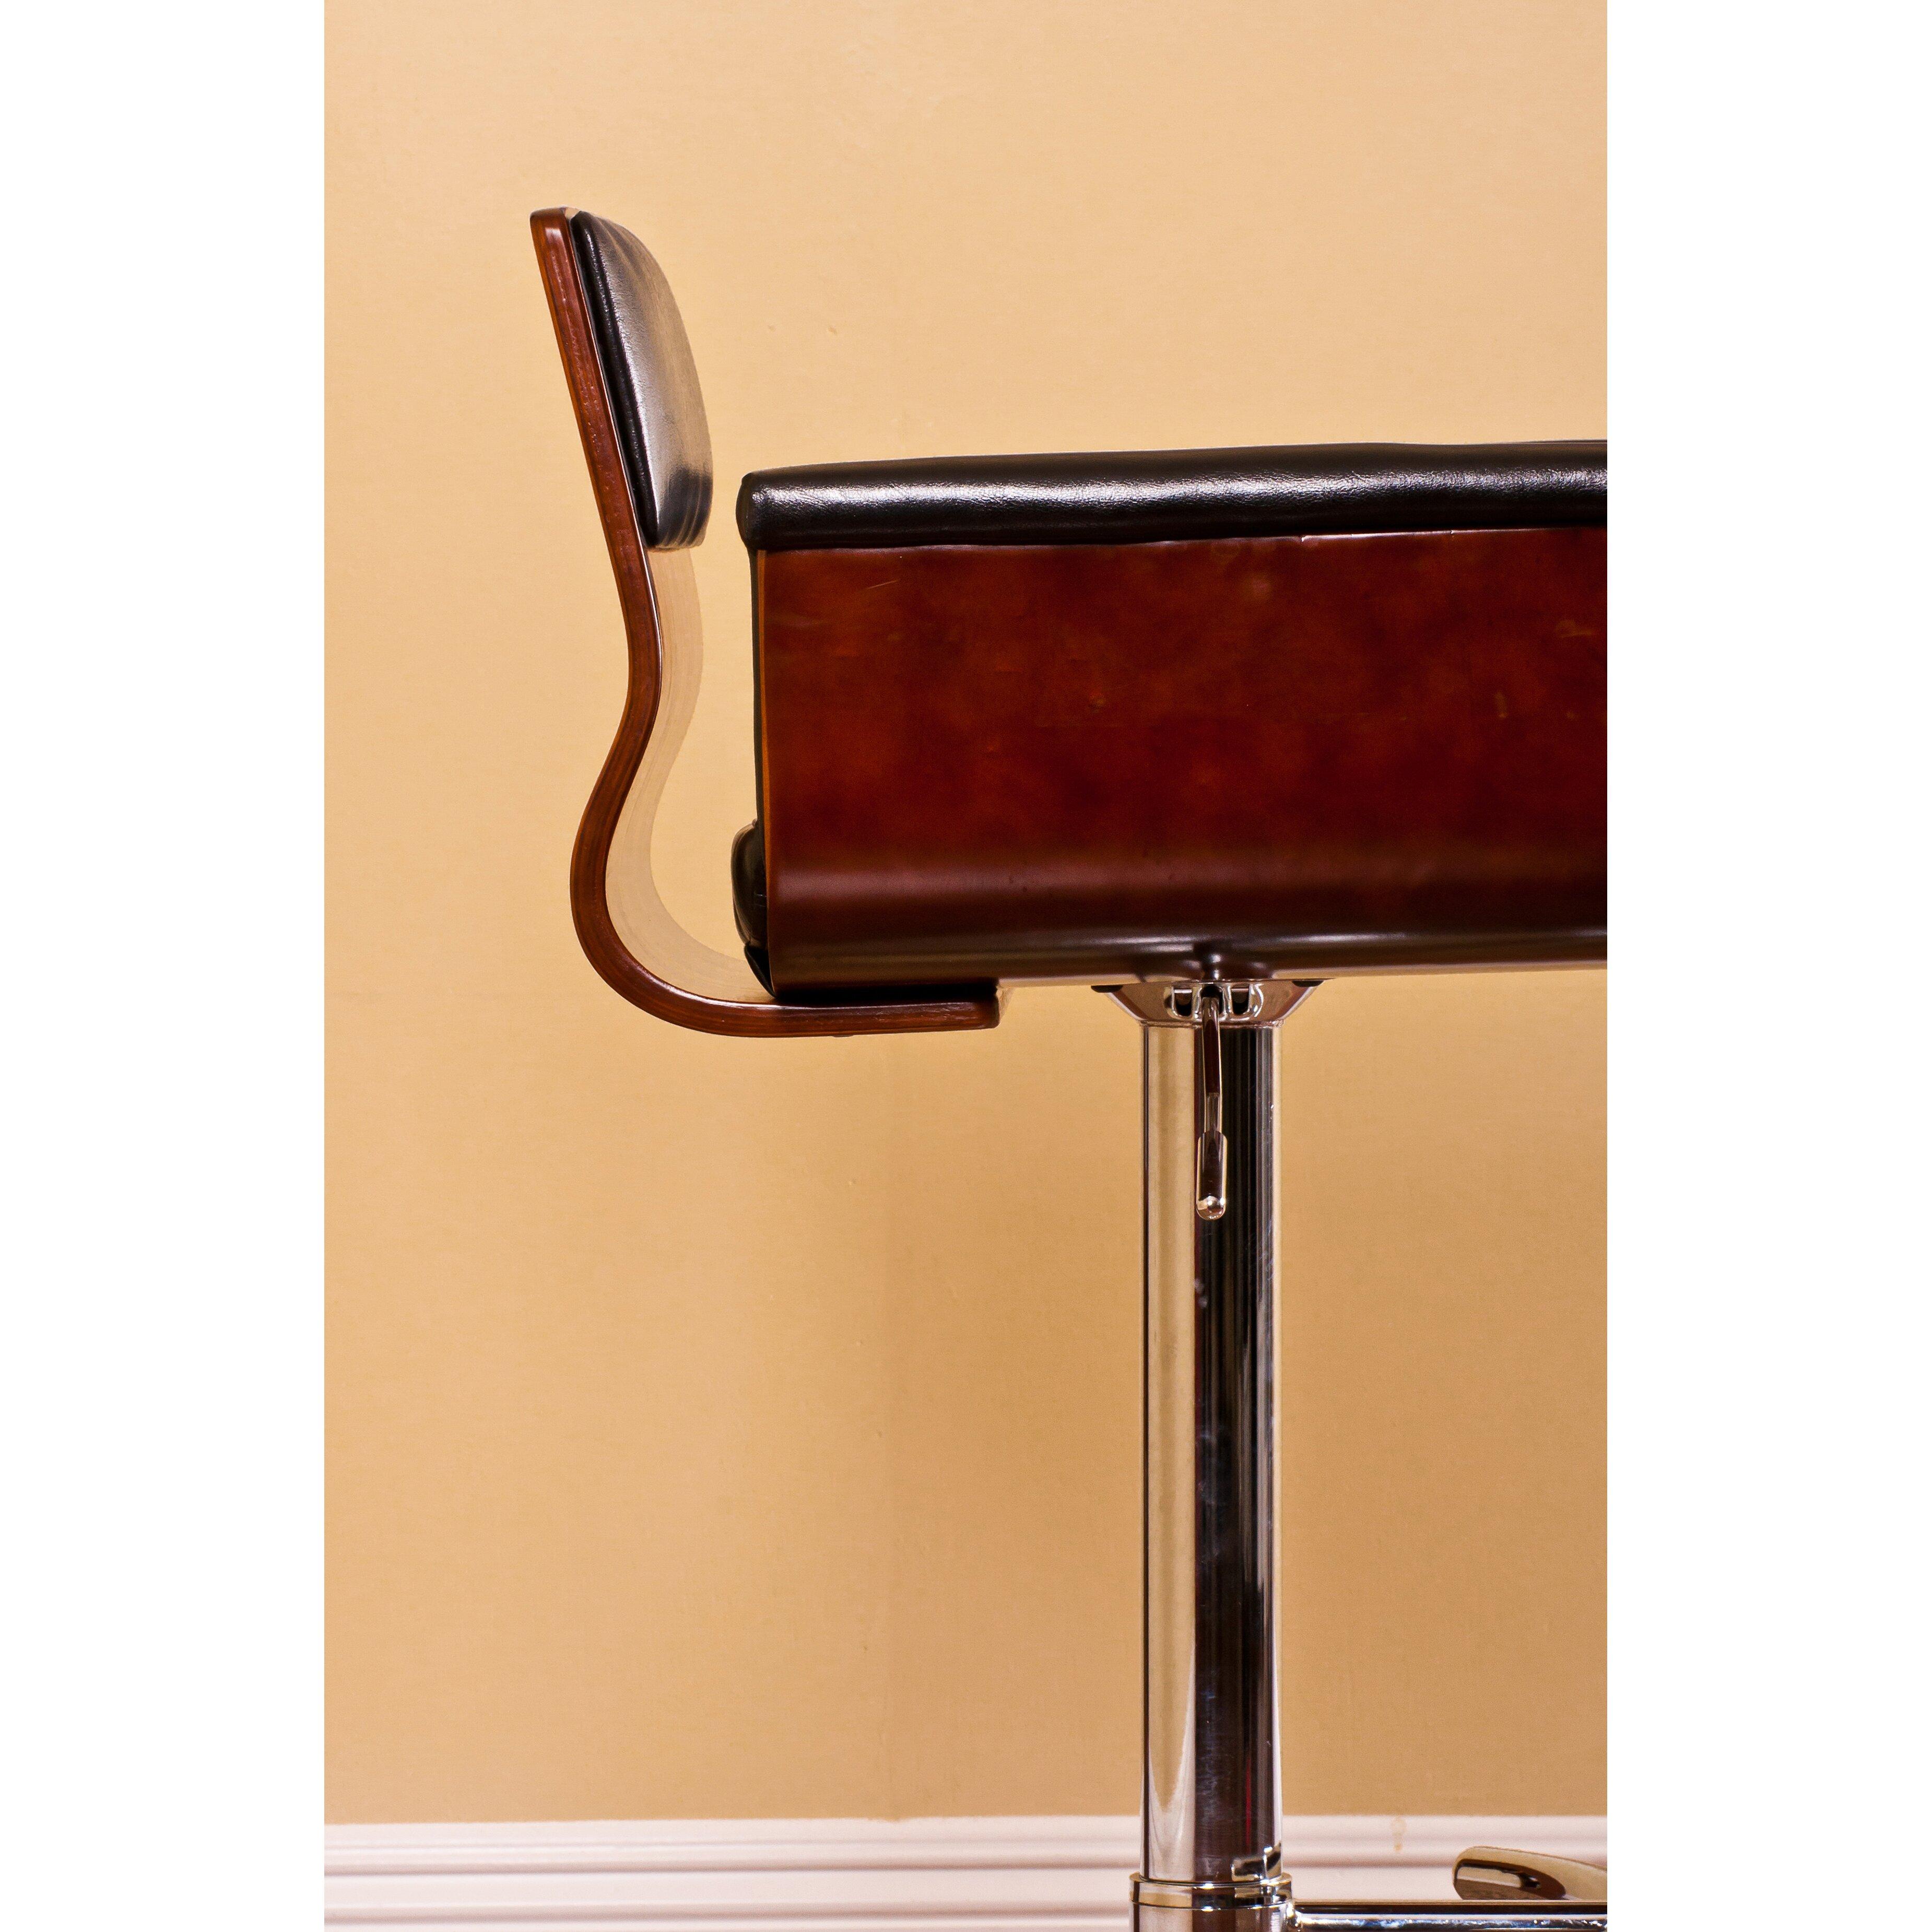 AC Pacific Adjustable Height Swivel Arm Bar Stool  : AC Pacific Adjustable Height Swivel Arm Bar Stool from www.wayfair.com size 3700 x 3700 jpeg 1541kB